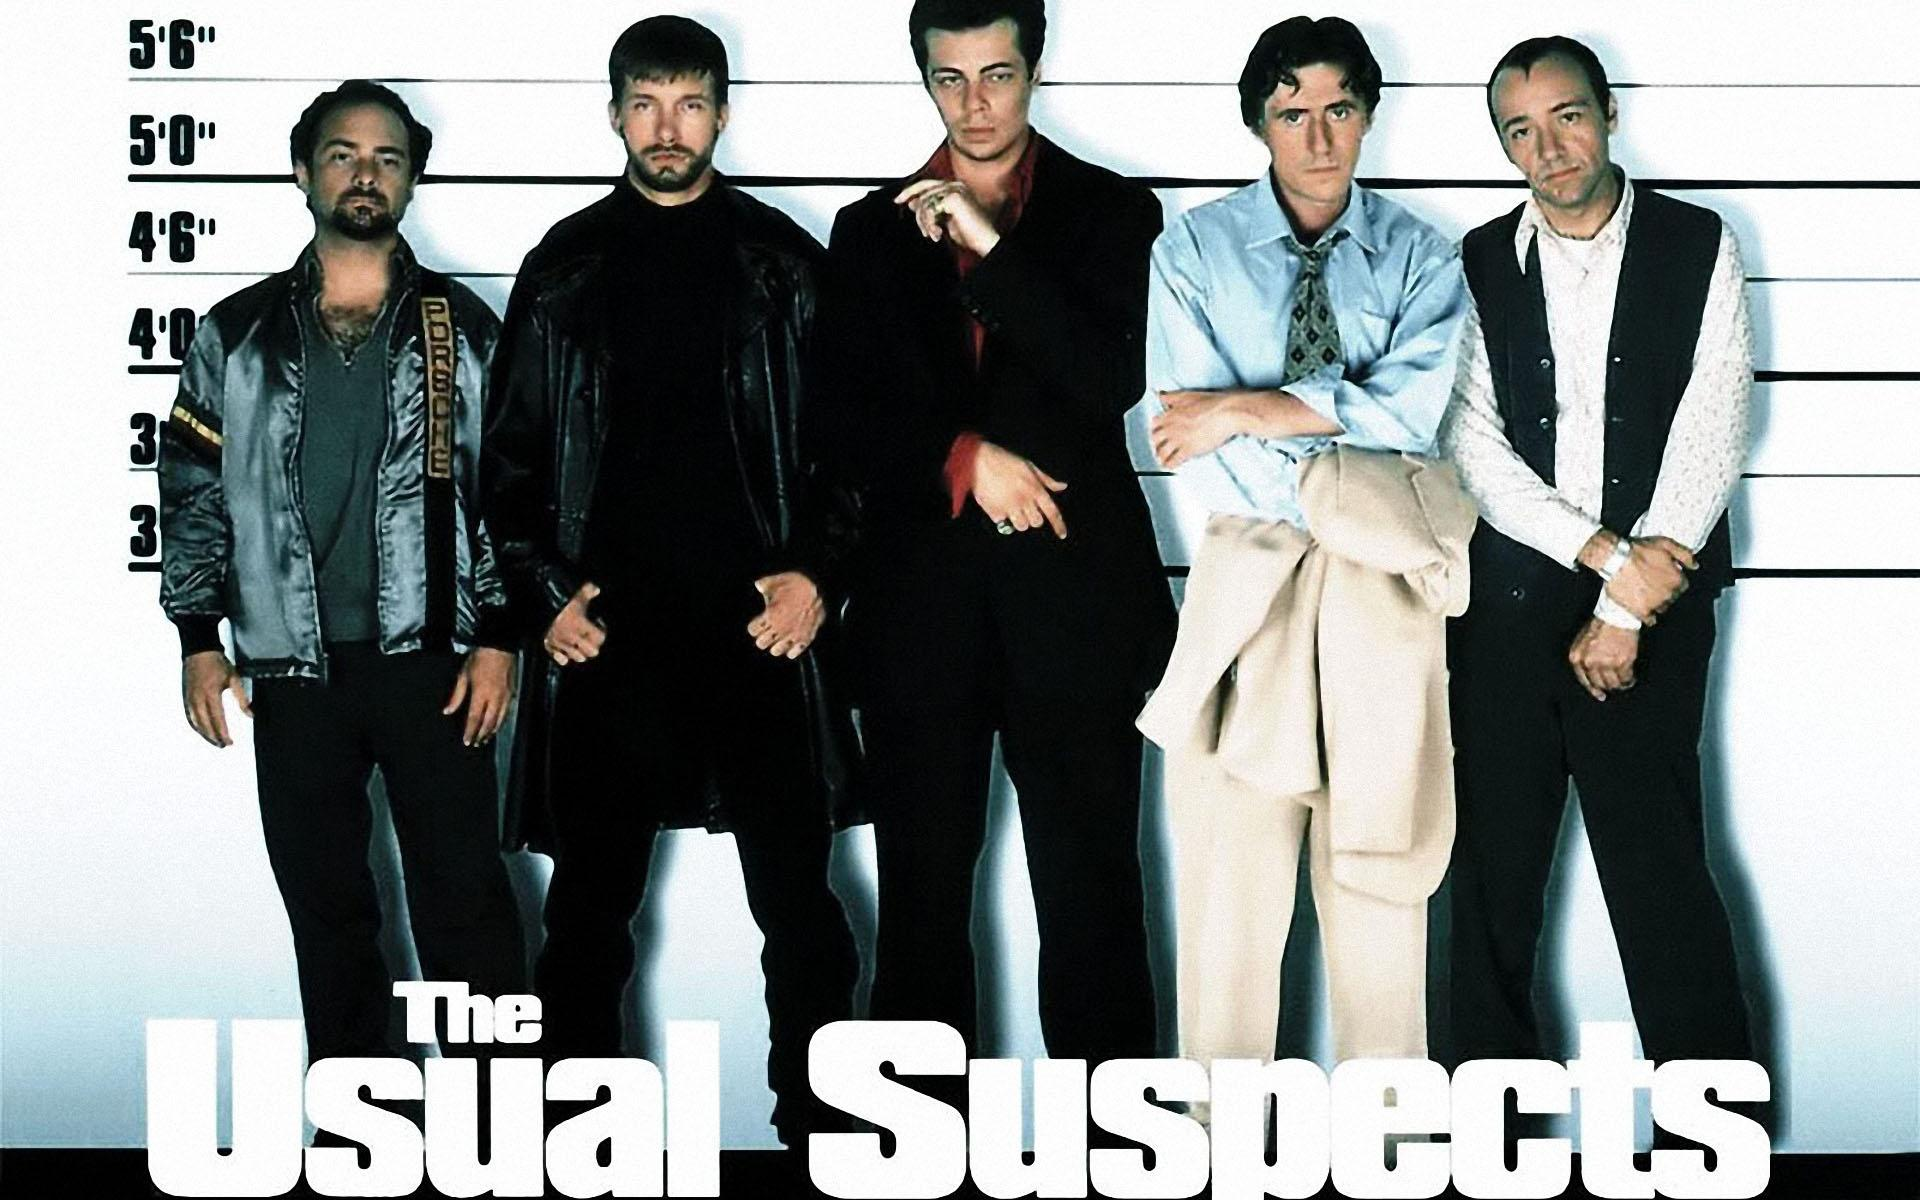 Dežurni krivci (Usual suspects) 1995